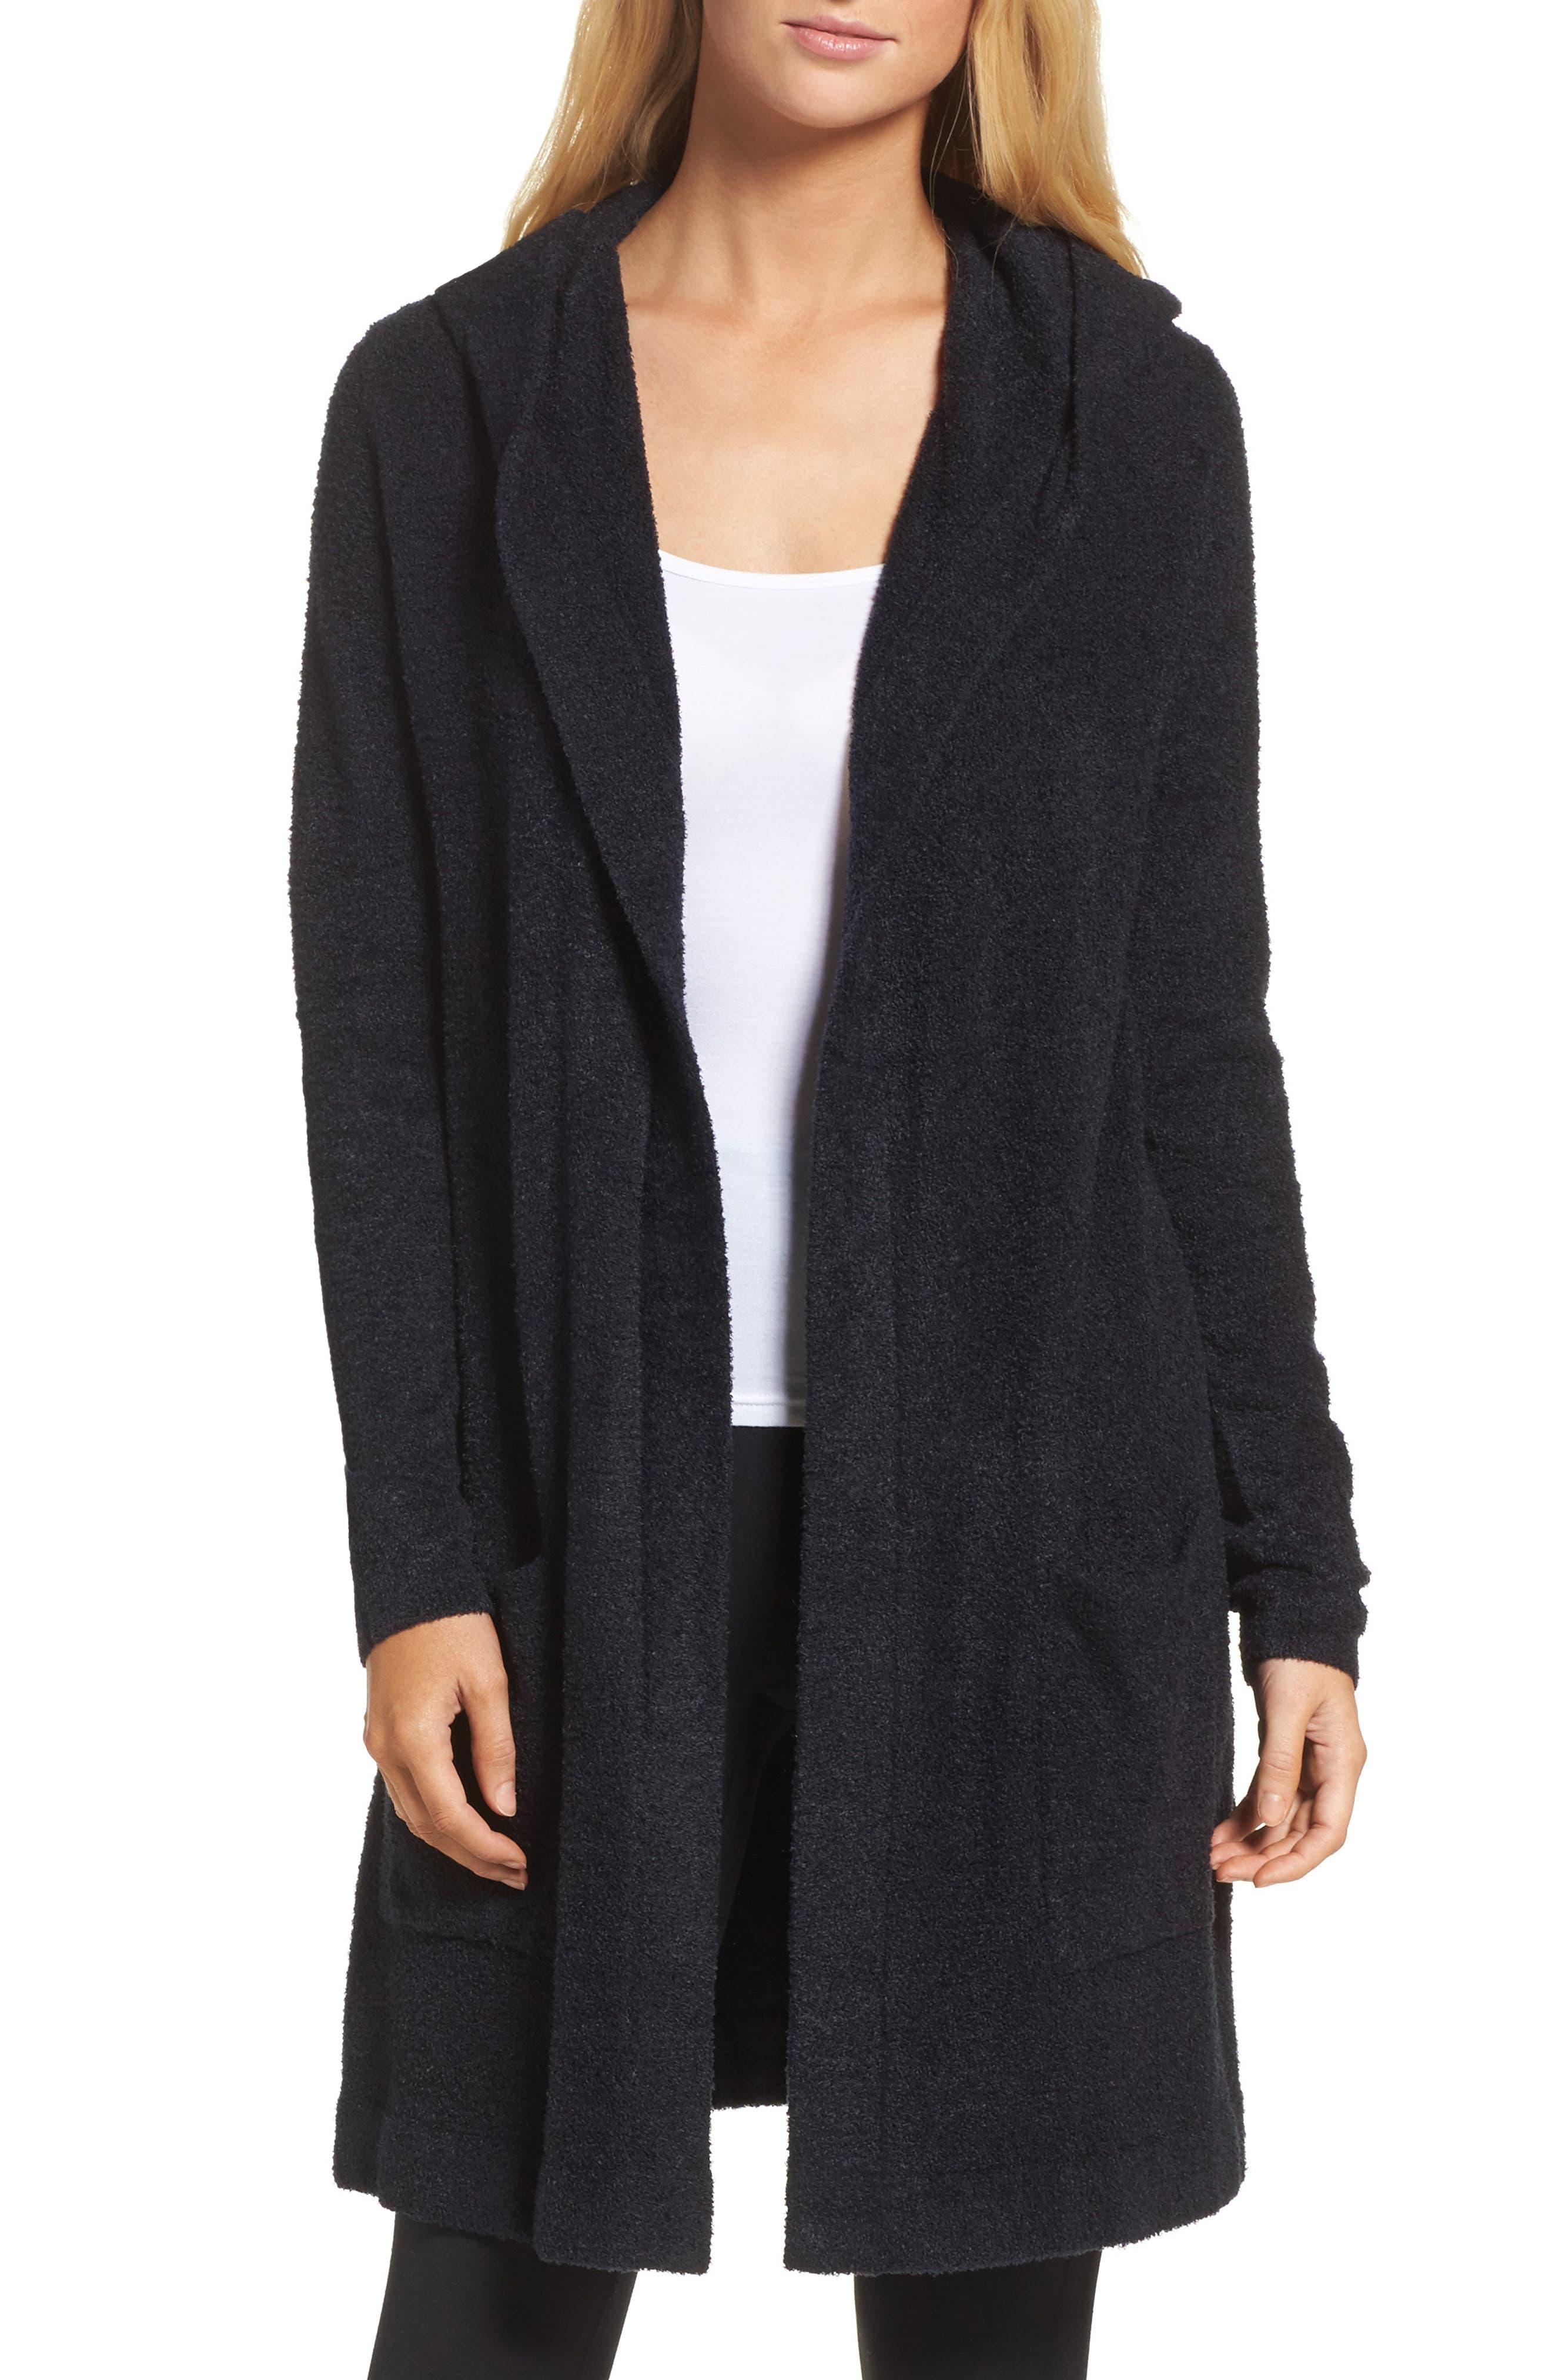 Alternate Image 1 Selected - Barefoot Dreams® Cozychic Lite® Coastal Hooded Cardigan